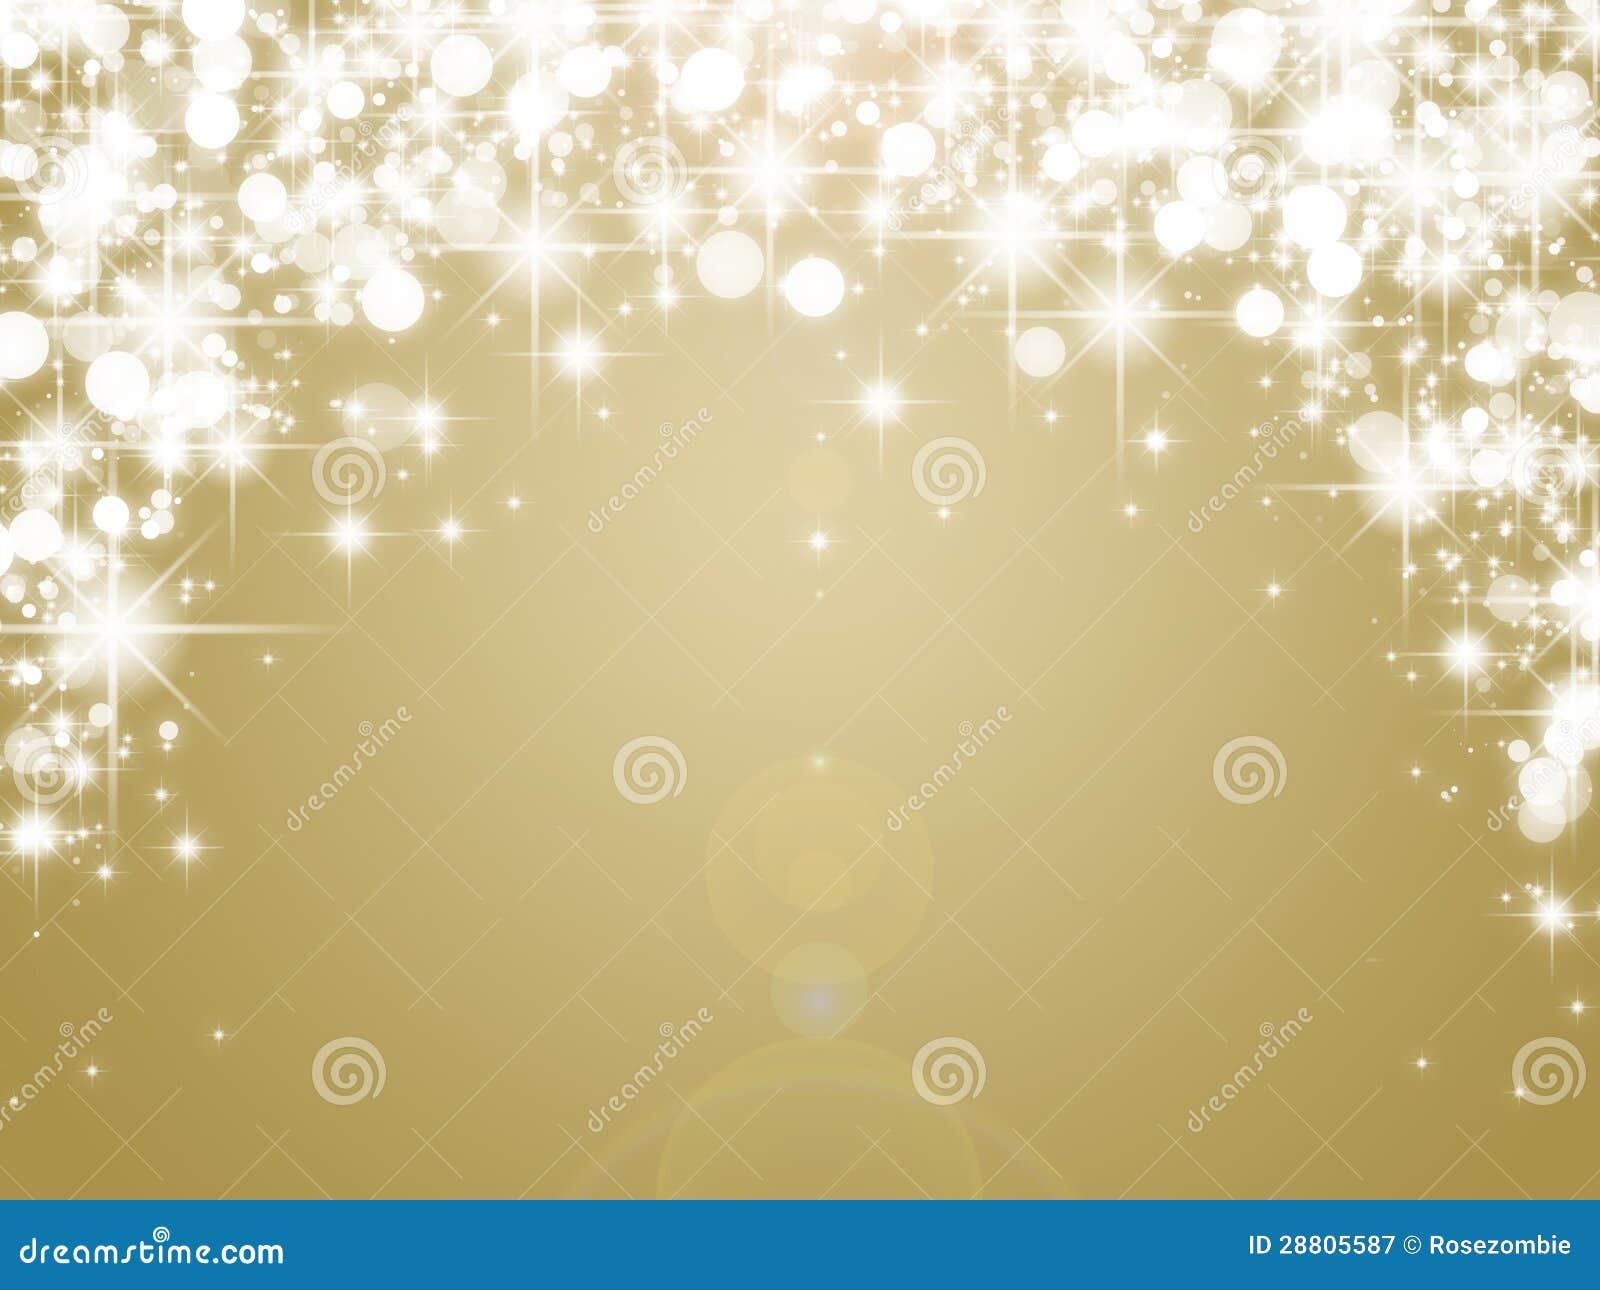 Elegant Christmas Background Stock Illustration